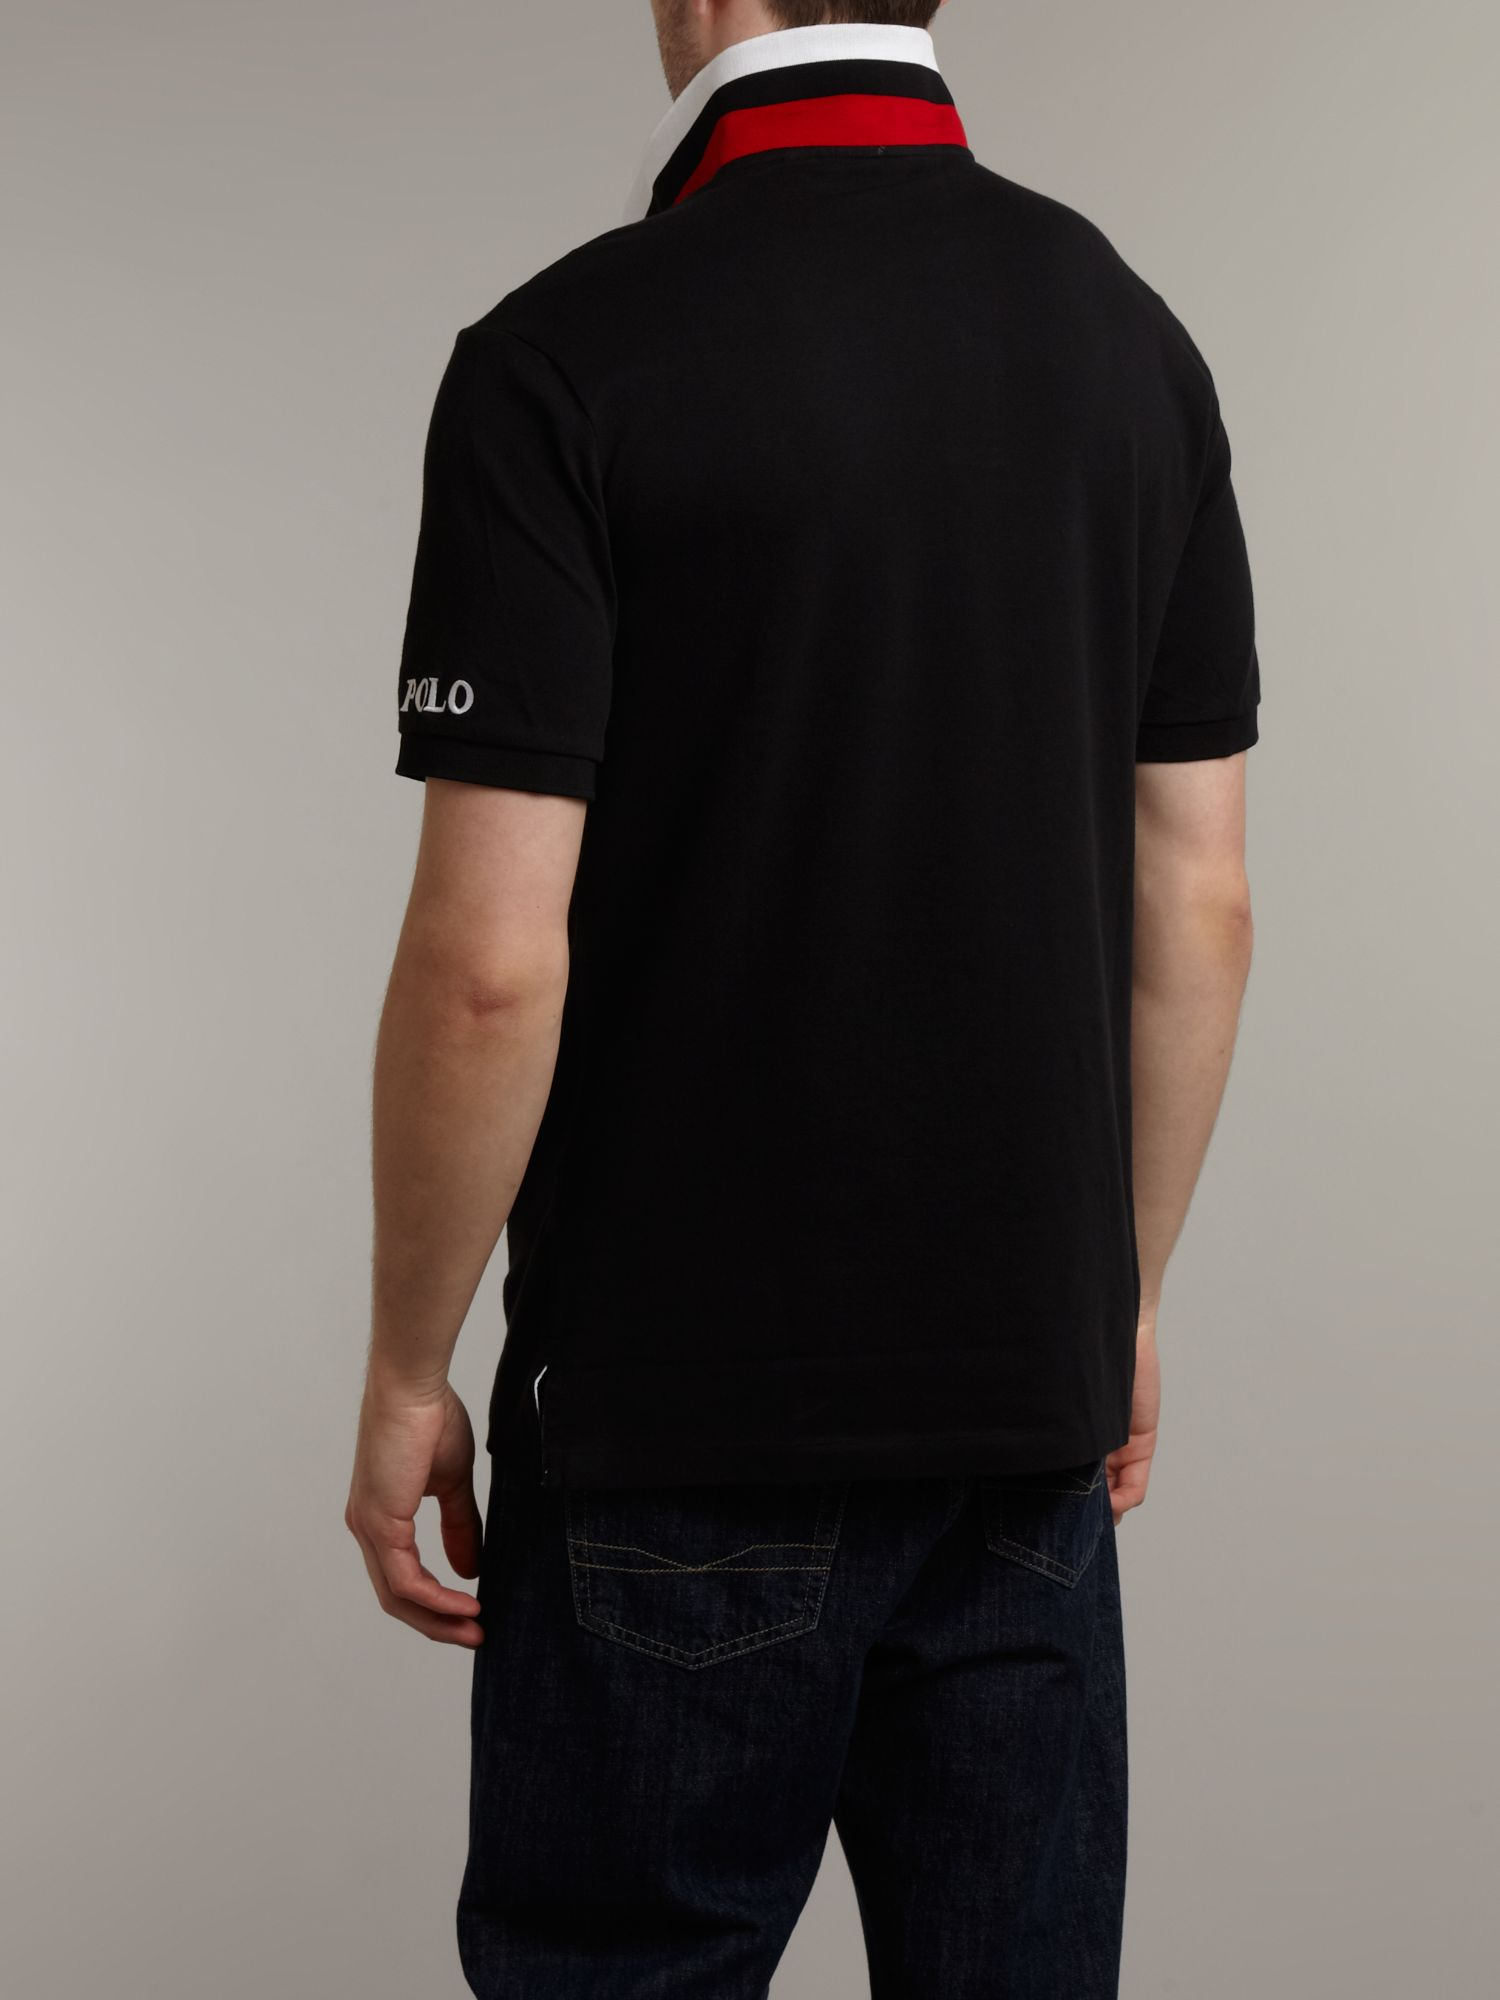 Ralph Lauren Polo Classic Big Pony Sweatshirt Black